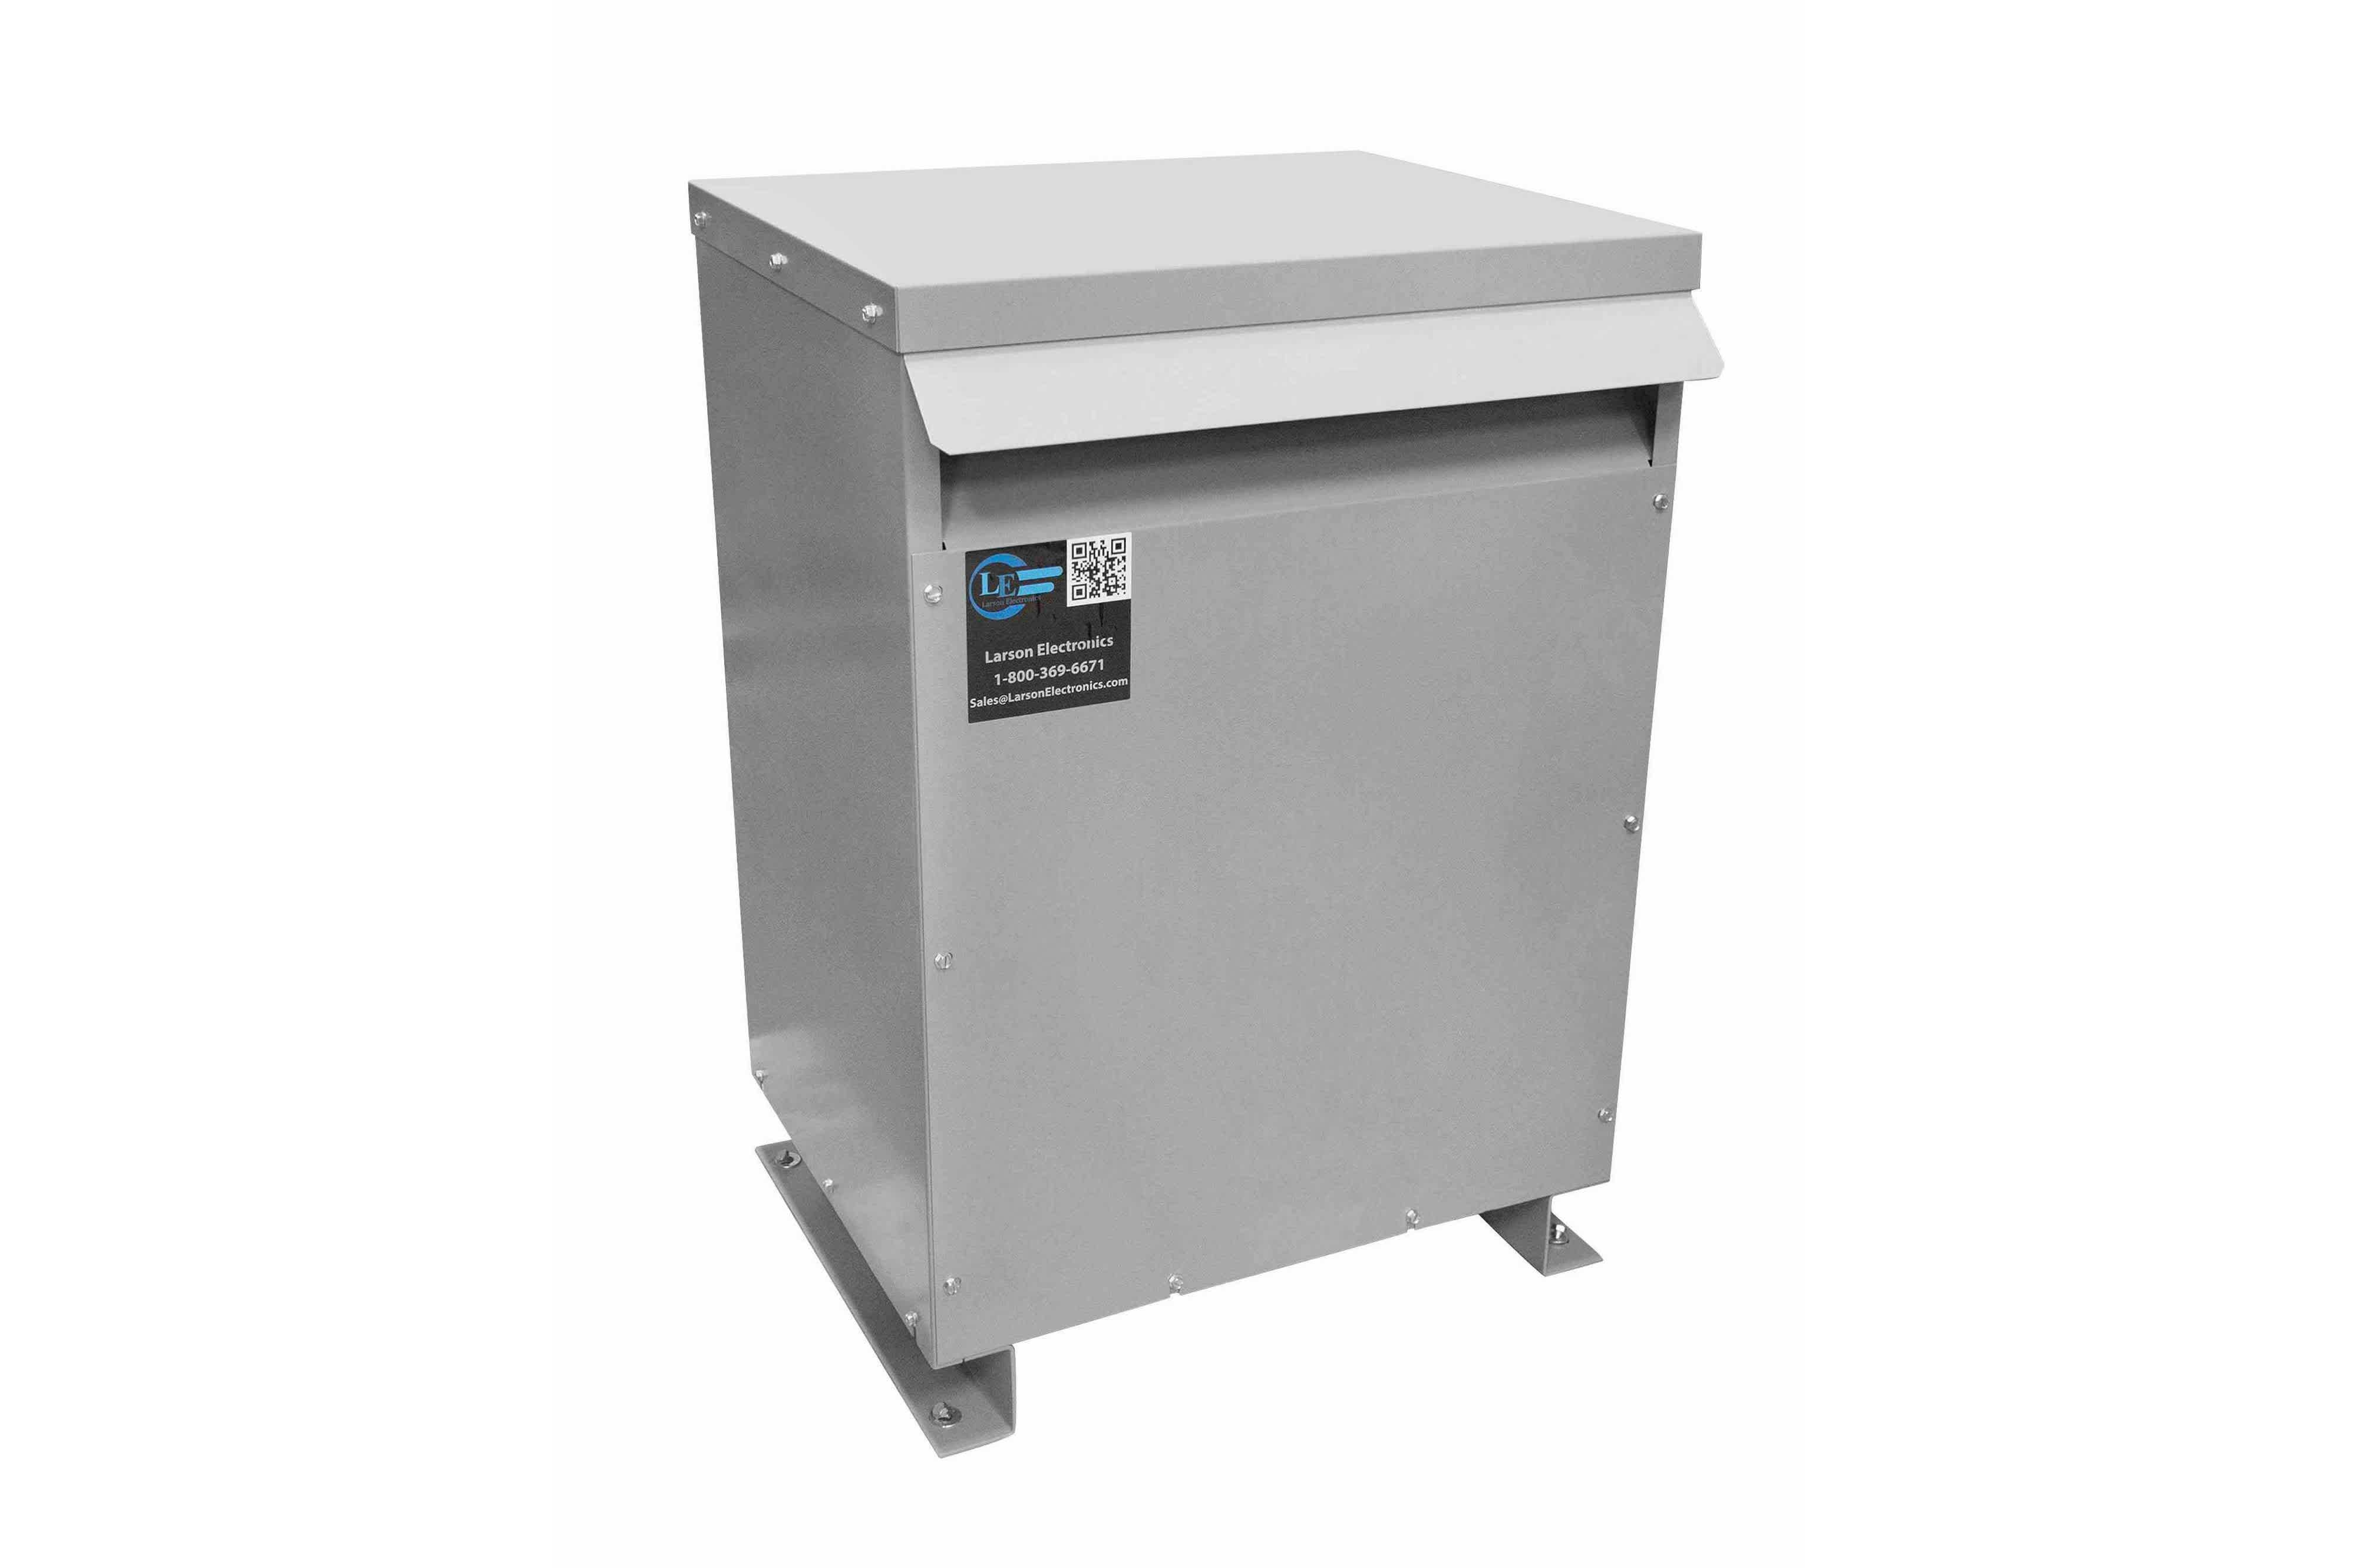 30 kVA 3PH DOE Transformer, 208V Delta Primary, 415Y/240 Wye-N Secondary, N3R, Ventilated, 60 Hz